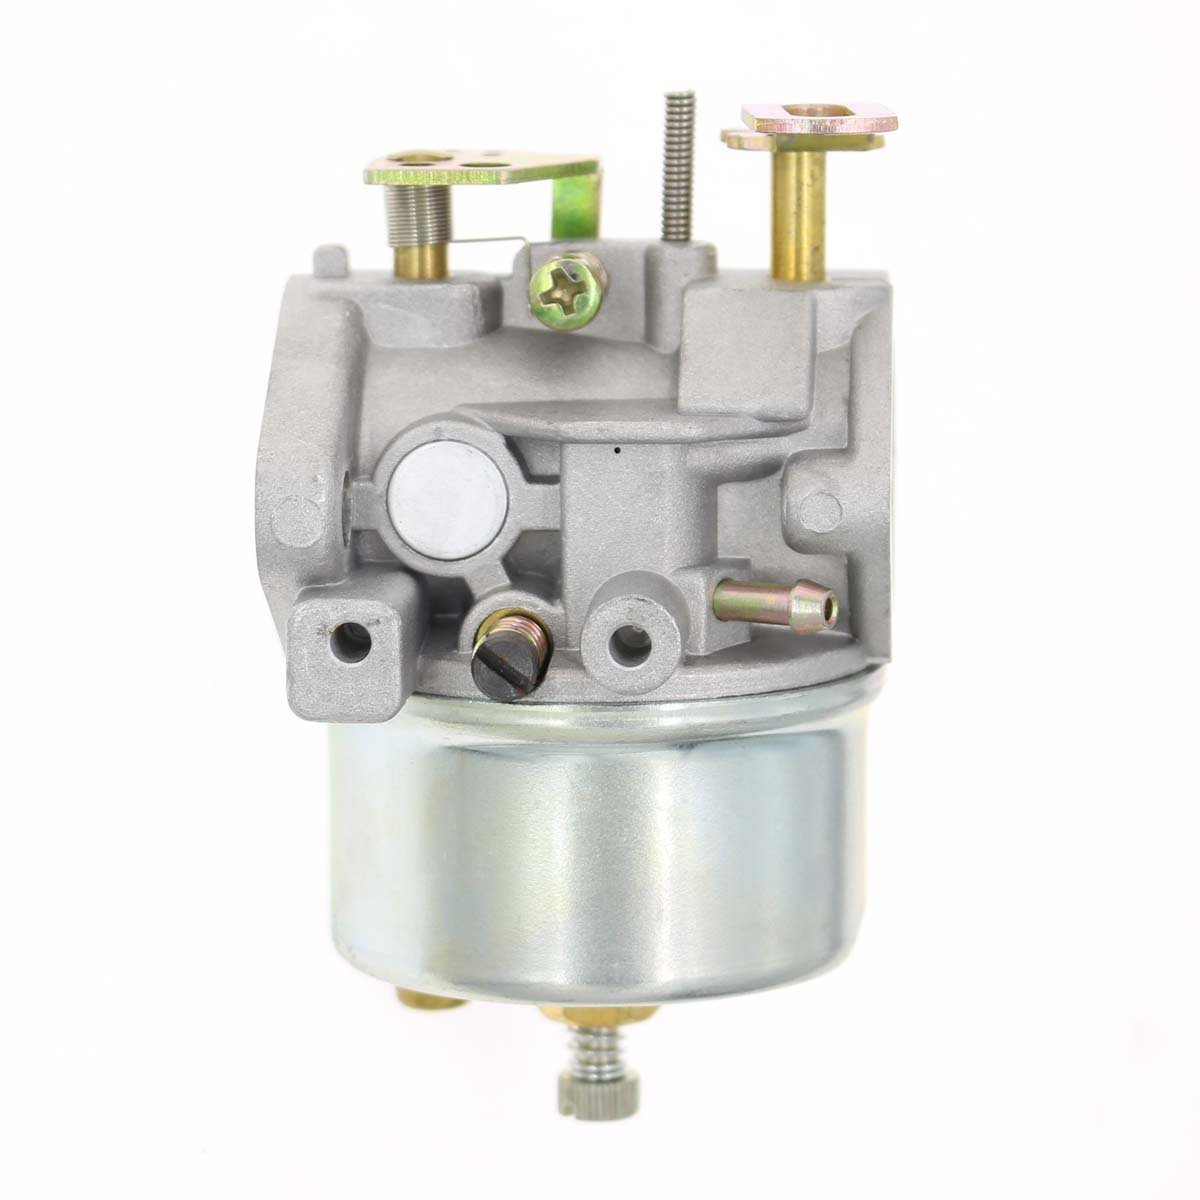 Lumix GC Carburetor For 8 HP MTD YARD MACHINES SNOW BLOWER 31AE640F000 31AE640E120 by Lumix GC